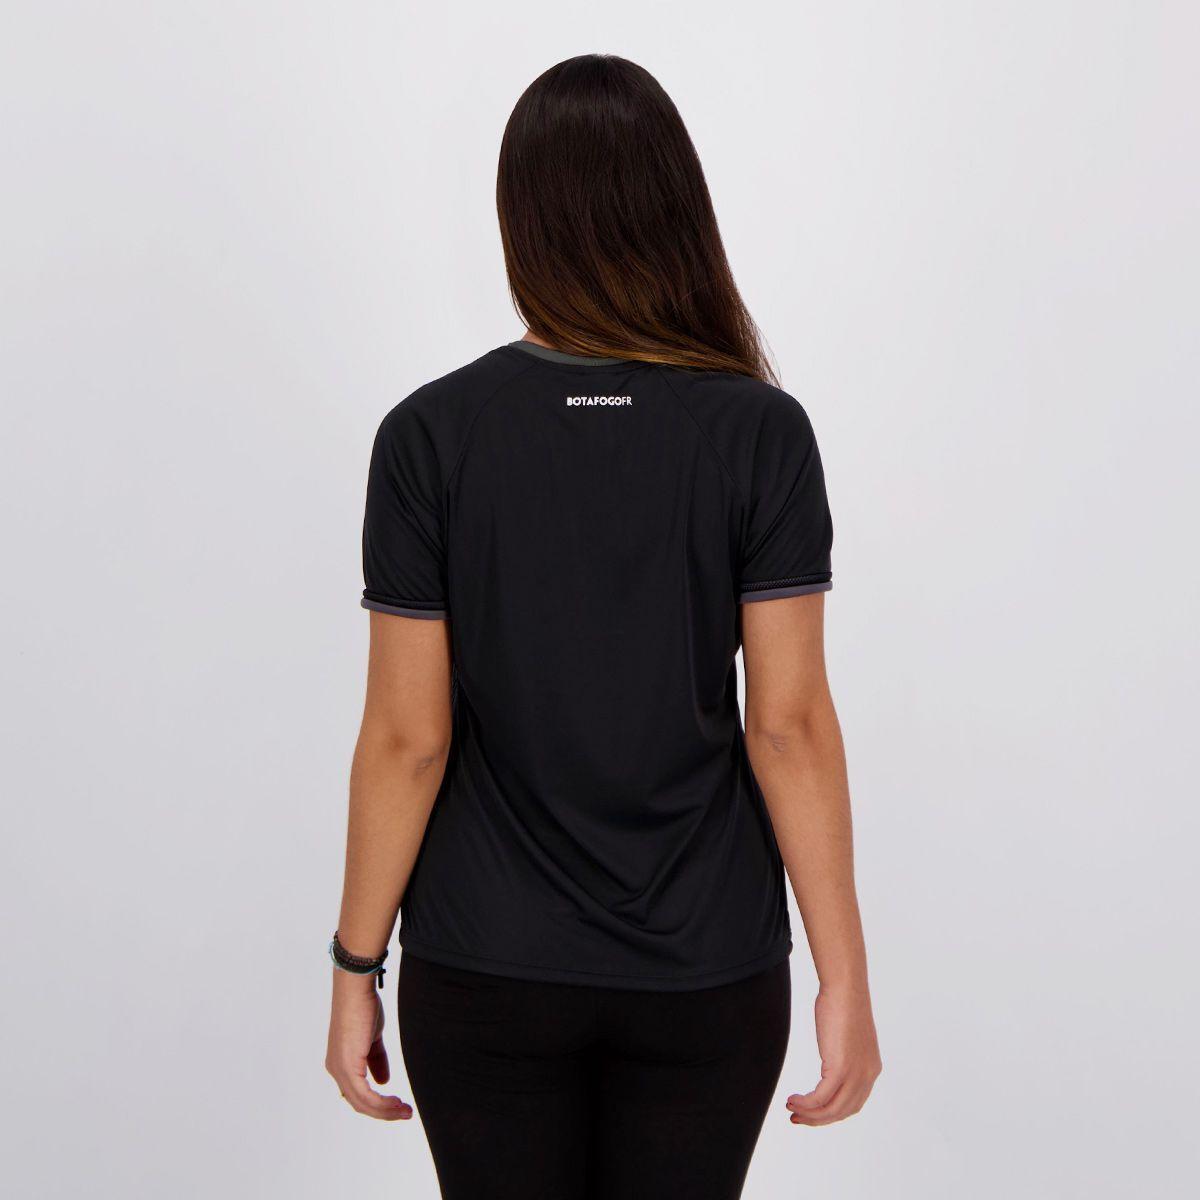 Camisa Botafogo Care Feminina